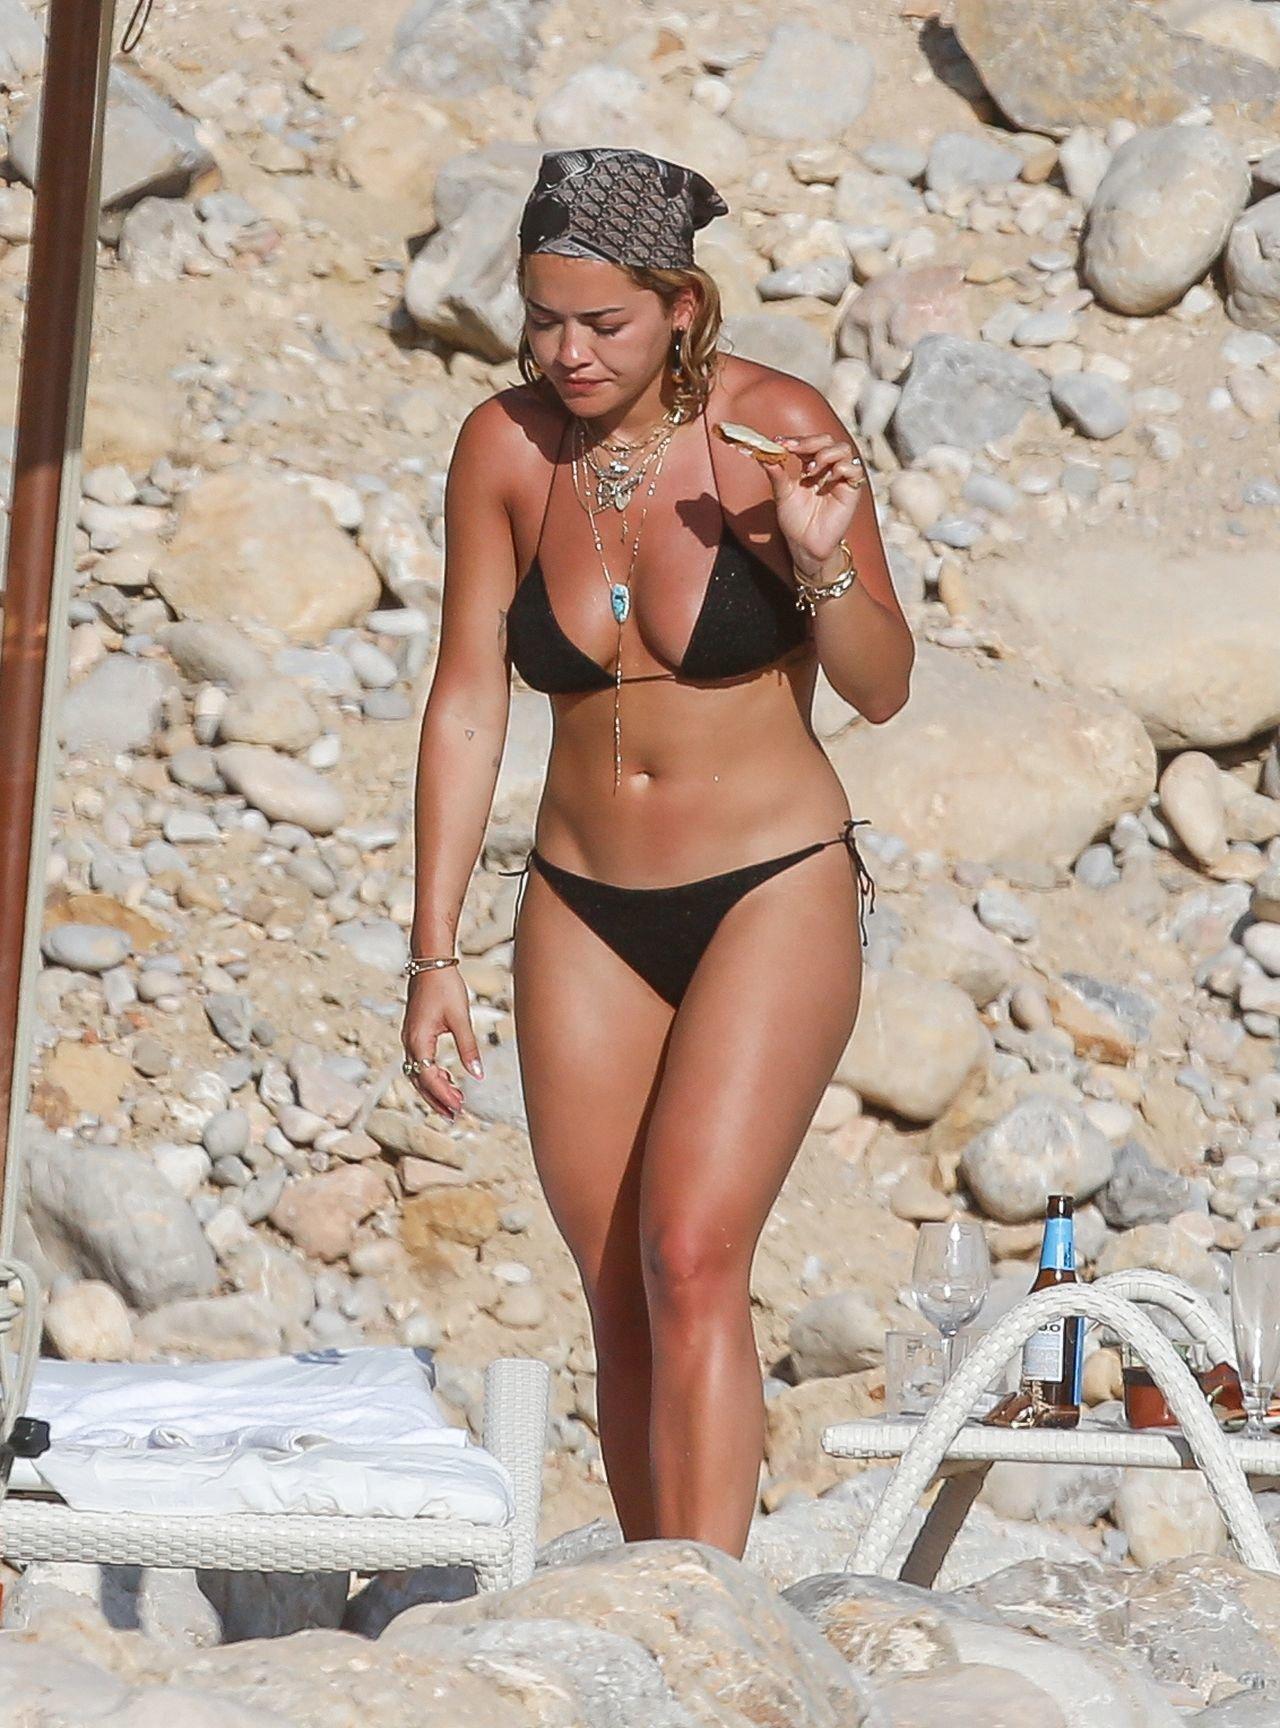 Rita Ora Instagram Nude Leaks 0021